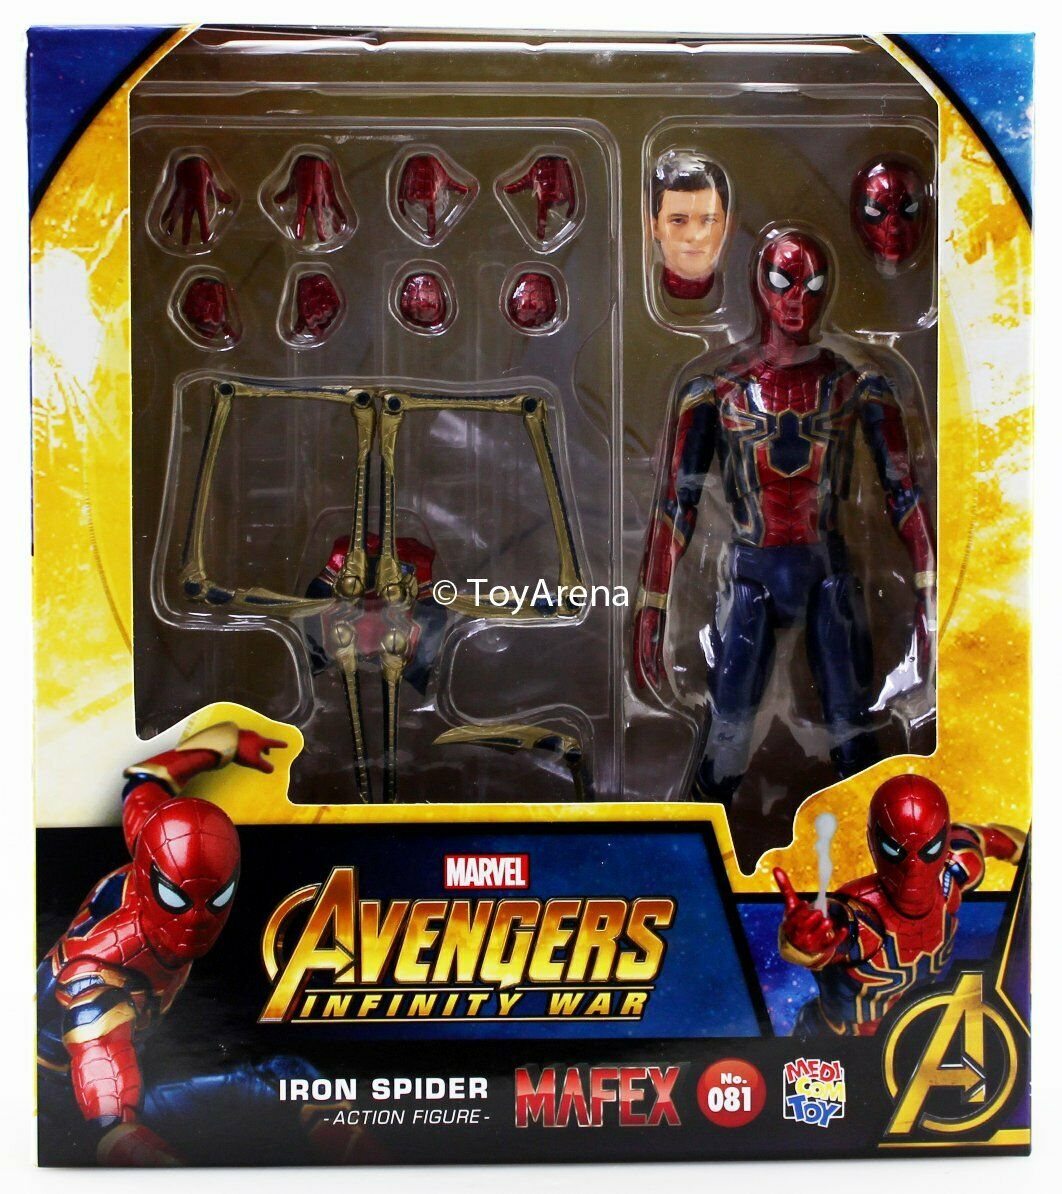 Mafex No. 081 Avengers Infinity War Iron Spider uomo cifra Medicom